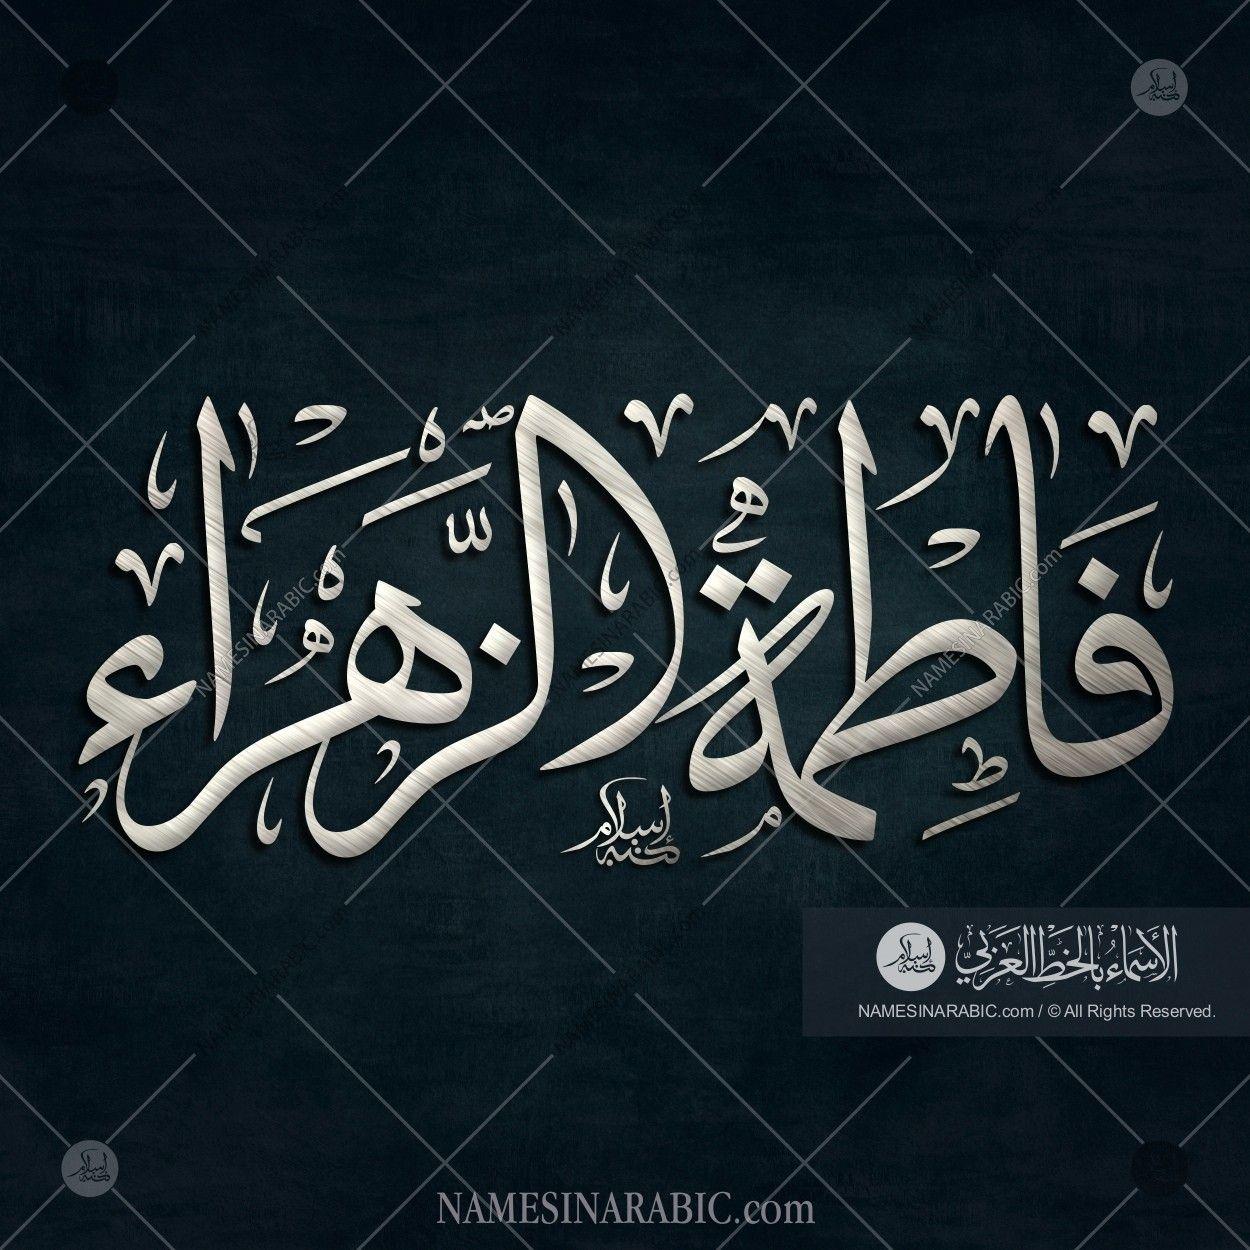 Fatima Al Zahra فاطمة الزهراء Names In Arabic Calligraphy Name 4013 Islamic Art Calligraphy Calligraphy Name Calligraphy